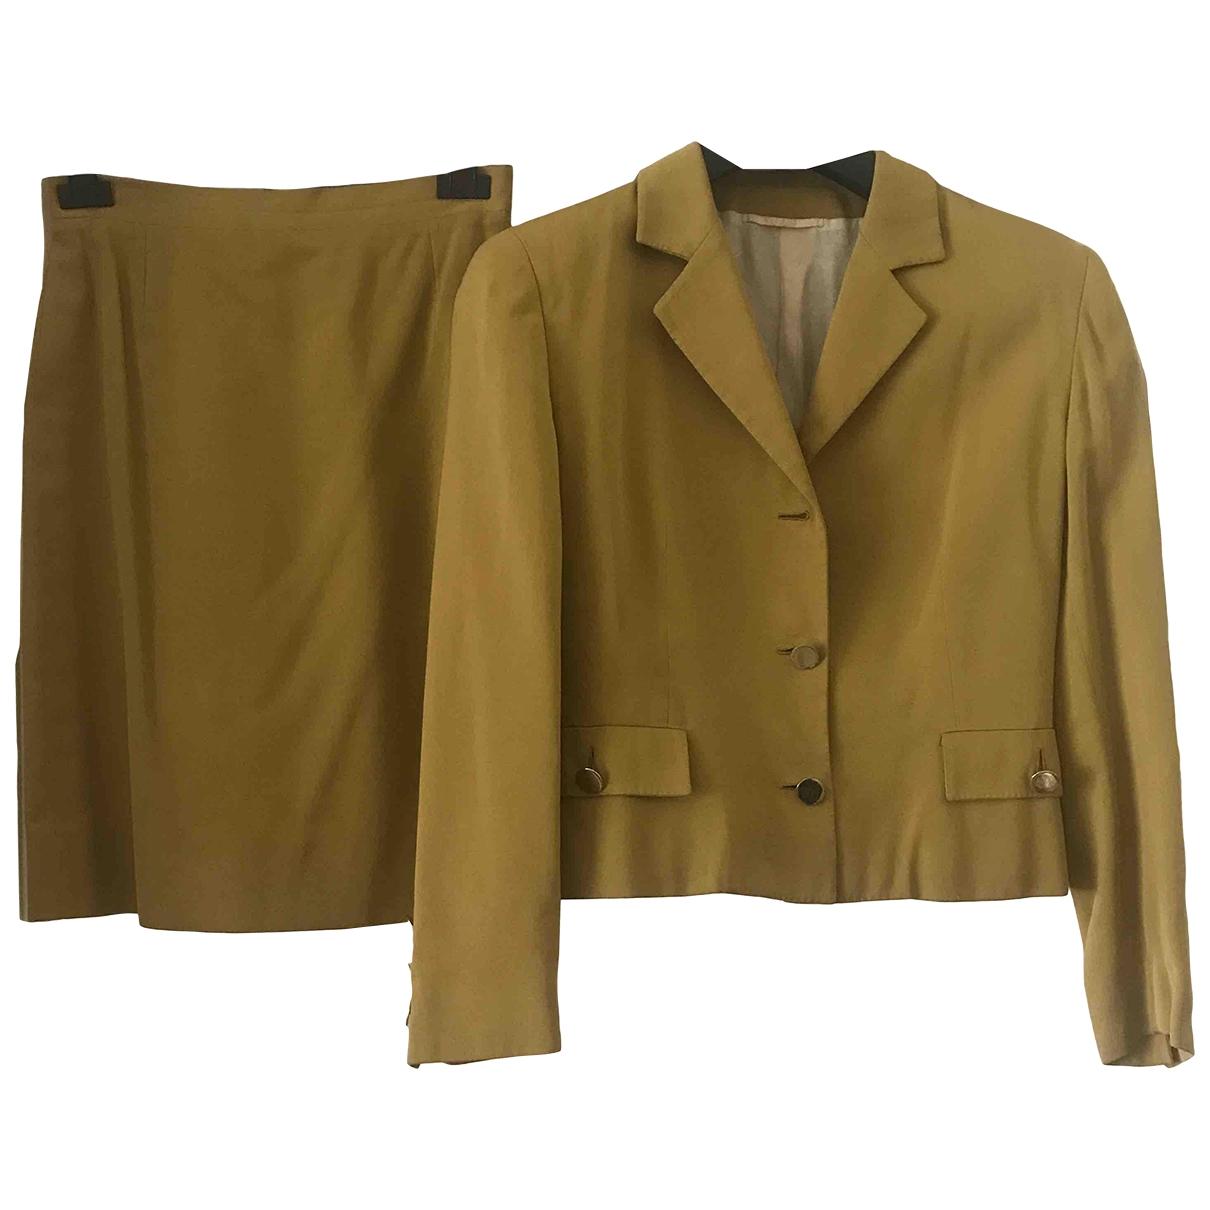 Brioni \N Camel Cotton skirt for Women 44 IT